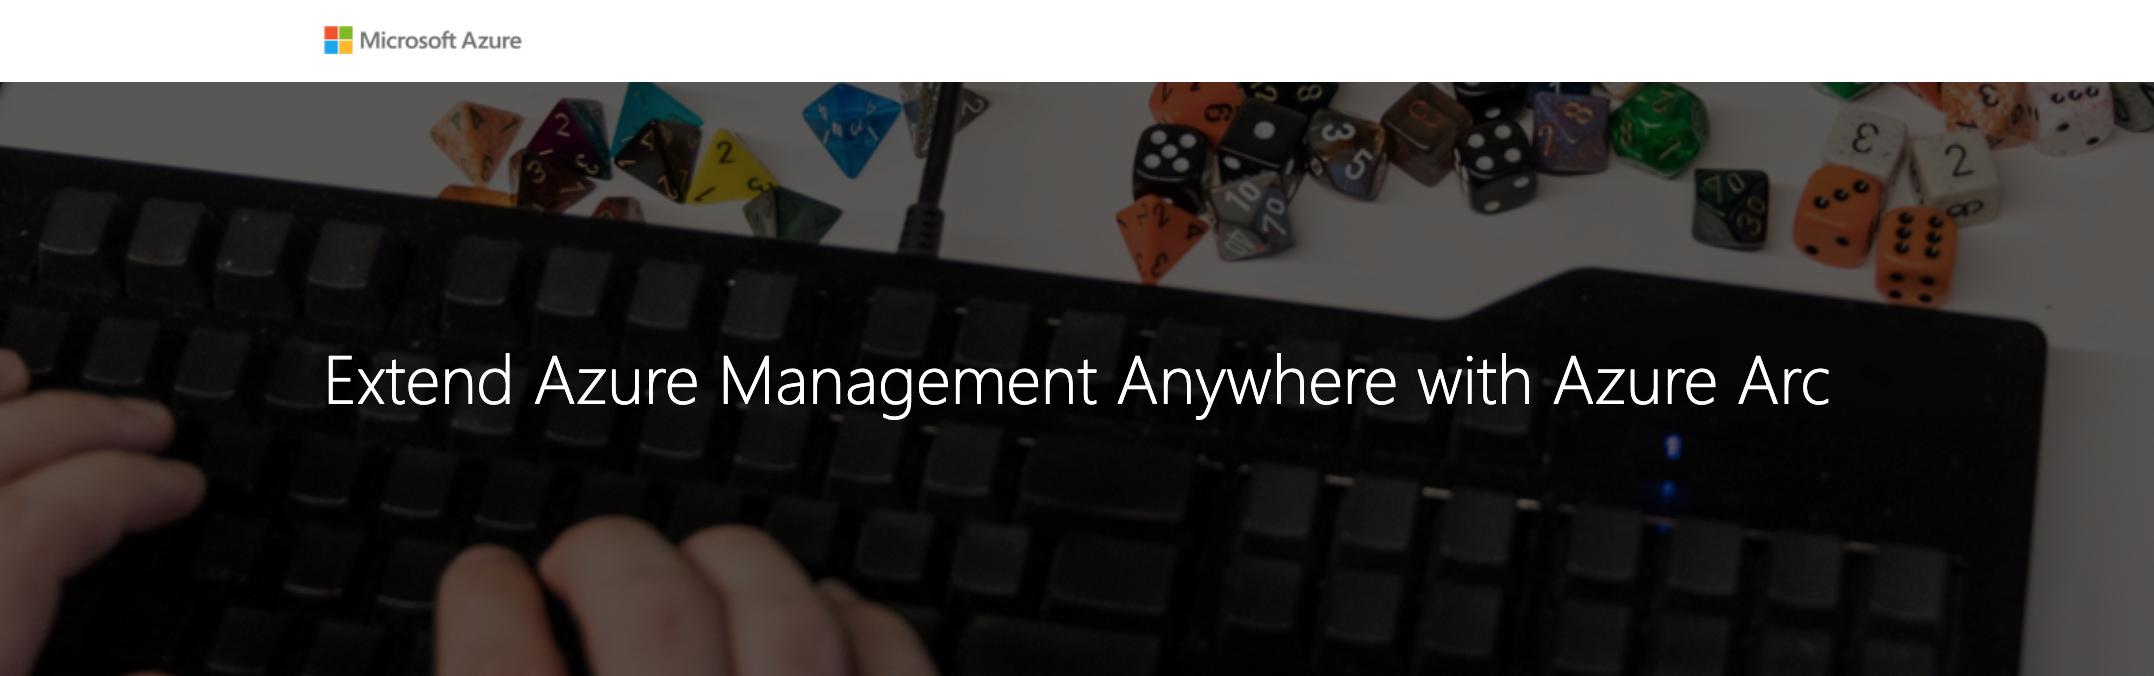 Microsoft Azure Webinar: Extend Azure Management Anywhere with Azure Arc